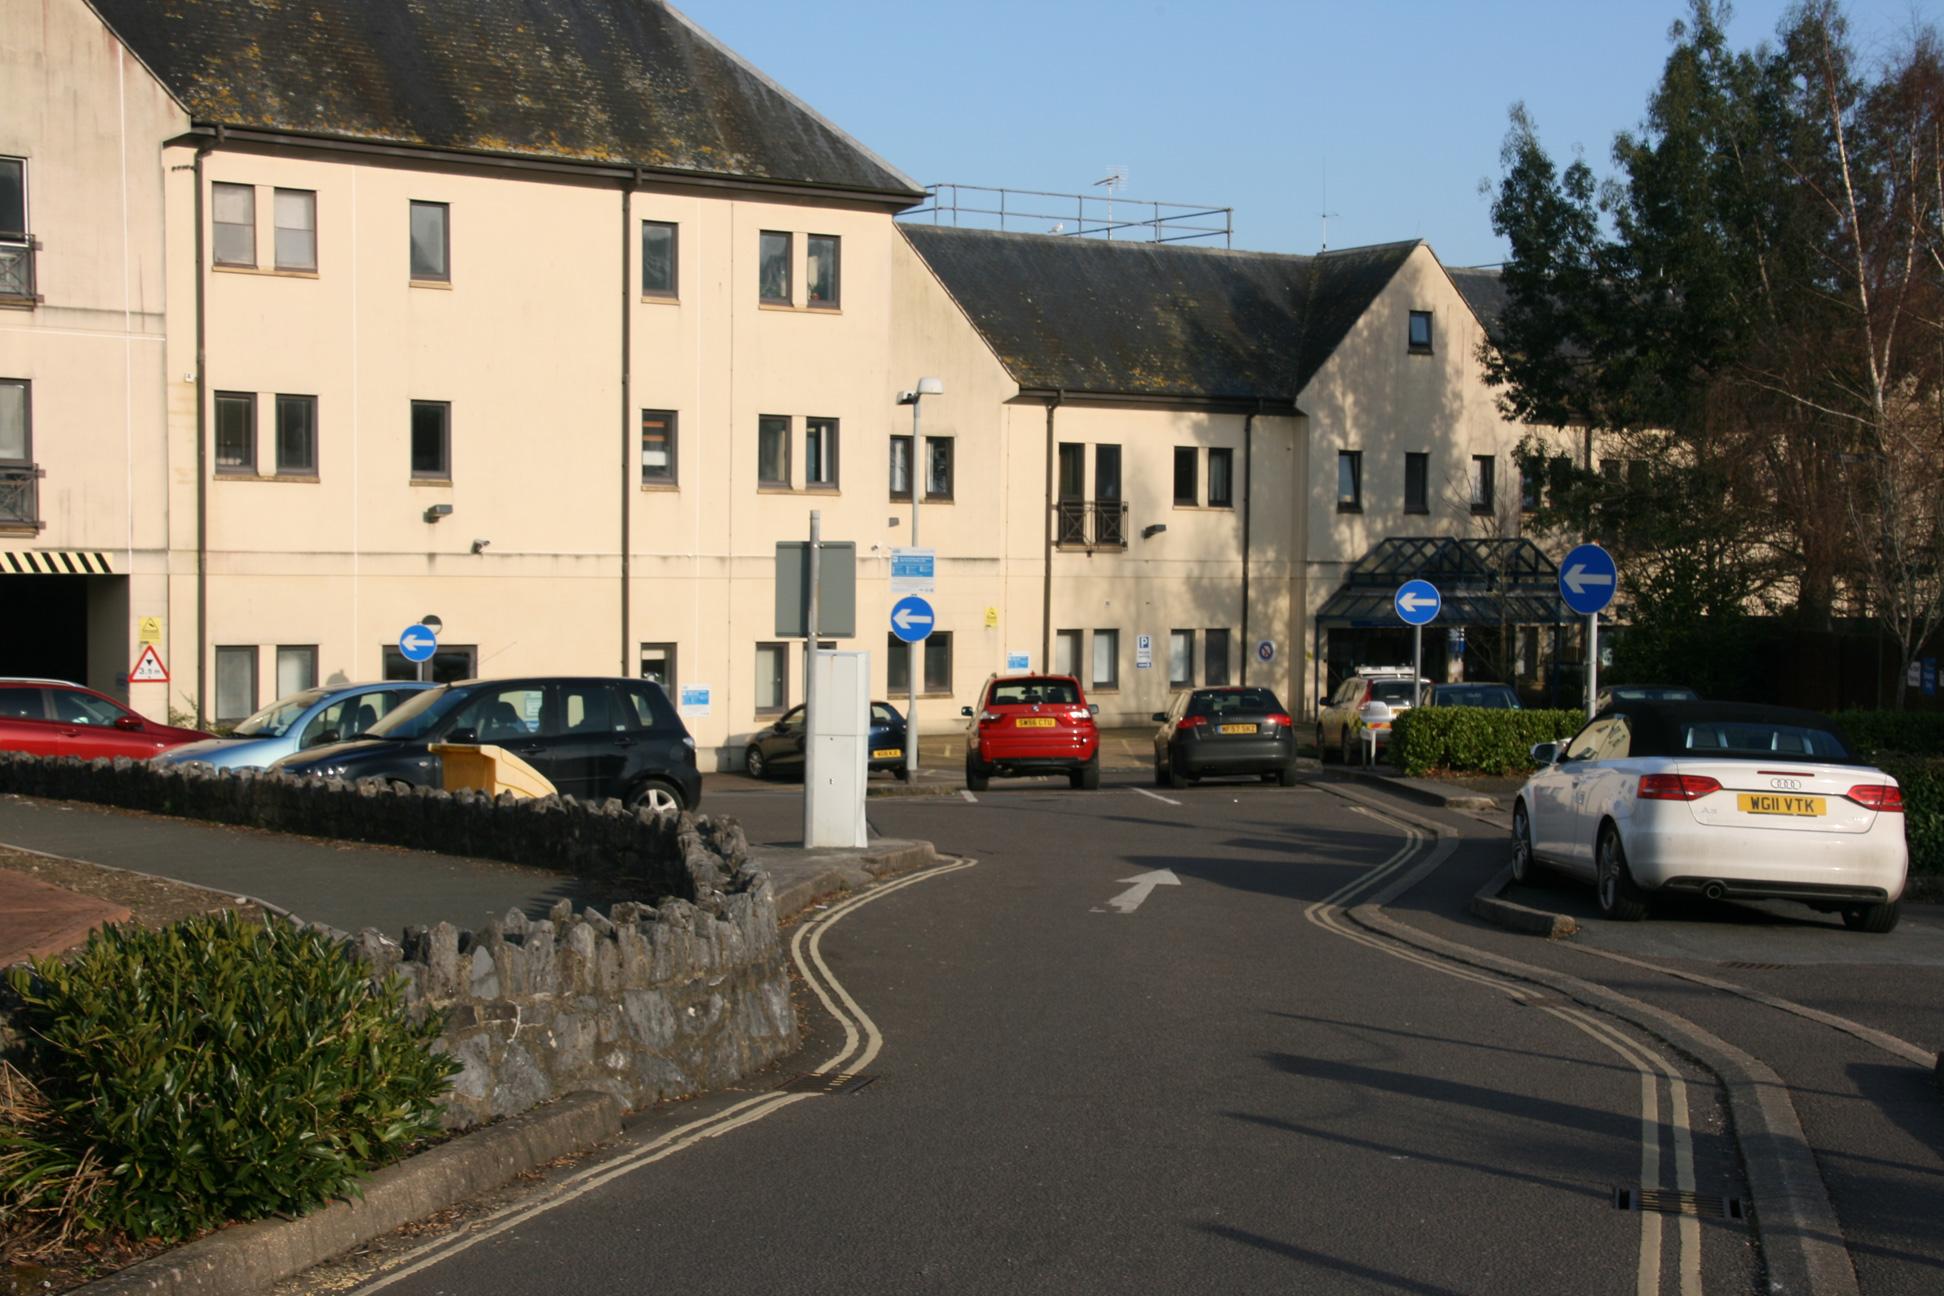 Totnes Community Hospital